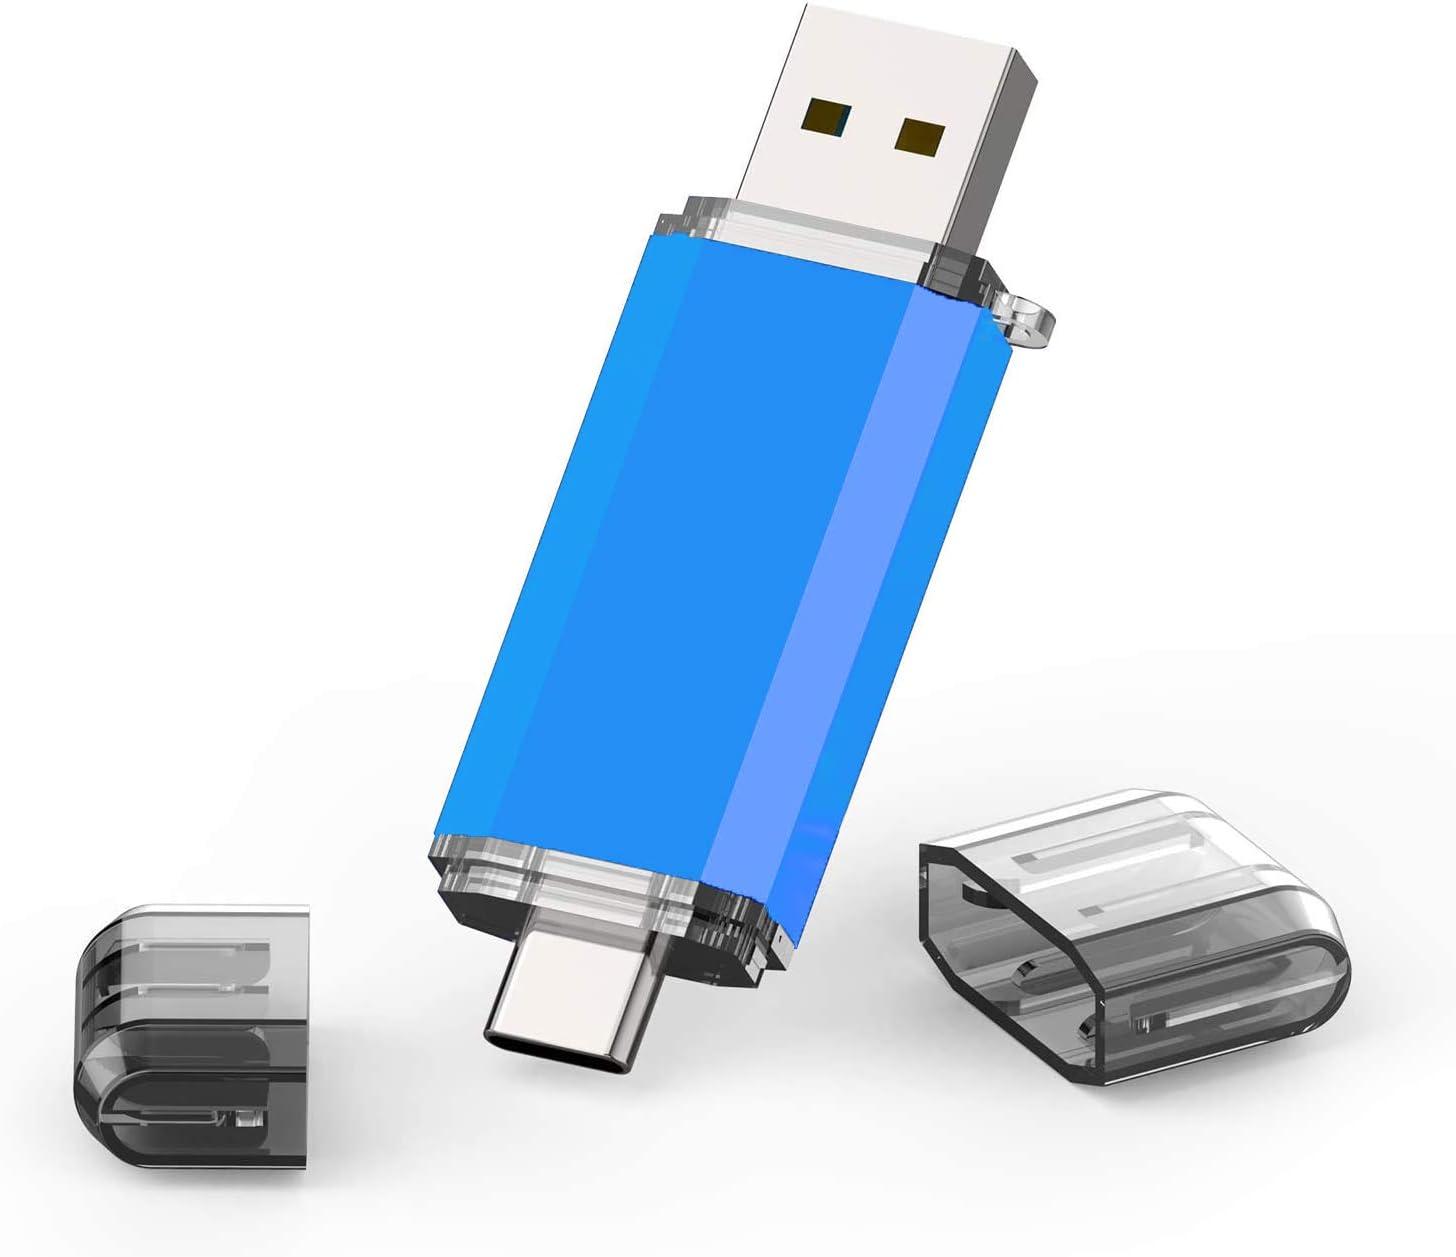 TOPESEL128GB OTG Flash Drive USB C Thumb Drive USB 3.0 Type C Dual Memory Stick for USB-C Smartphones,Tablets & New MacBook